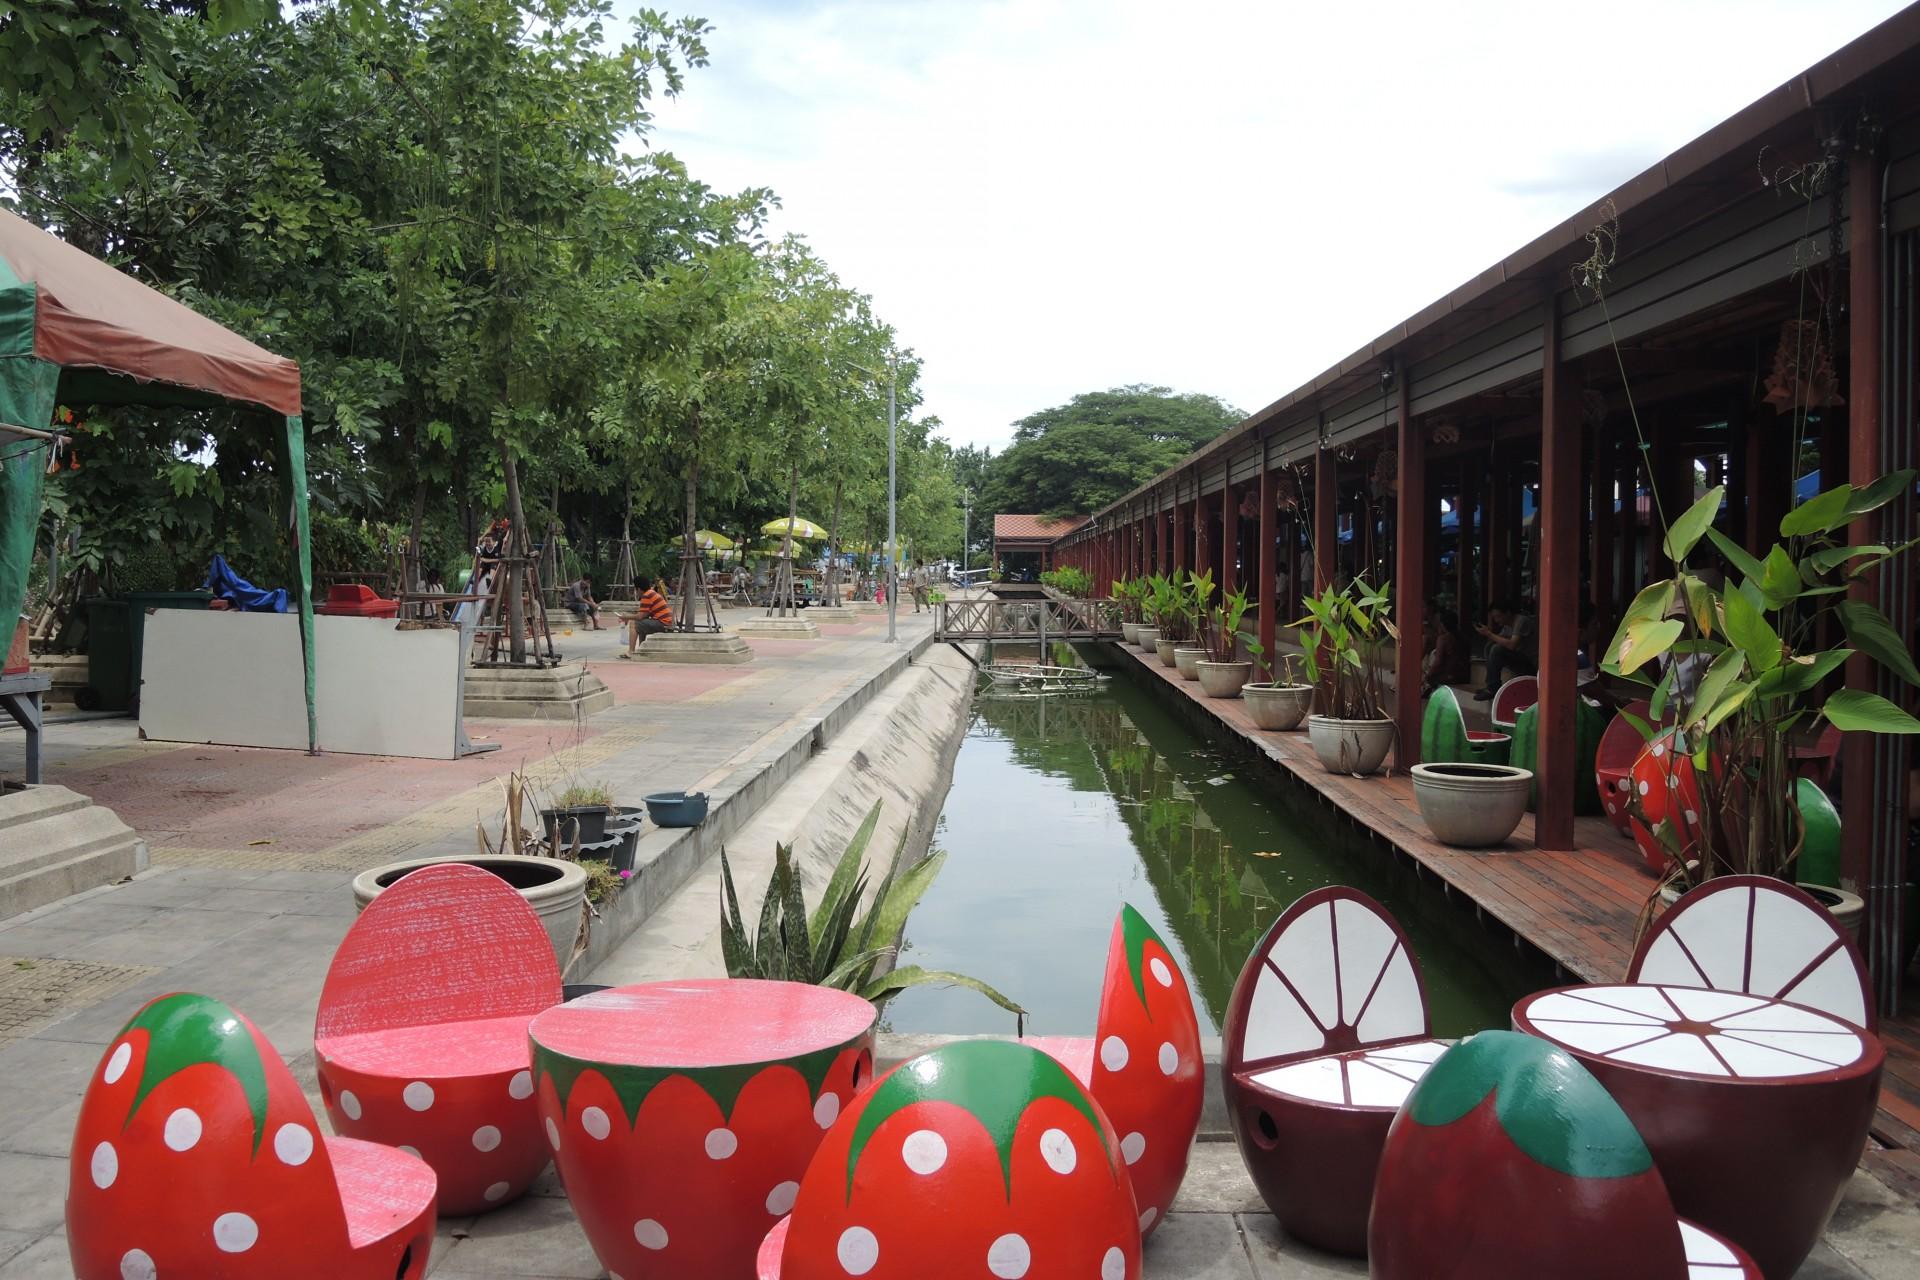 大林江水上市場 Taling Chan Floating Market │ 曼谷市區的小綠洲